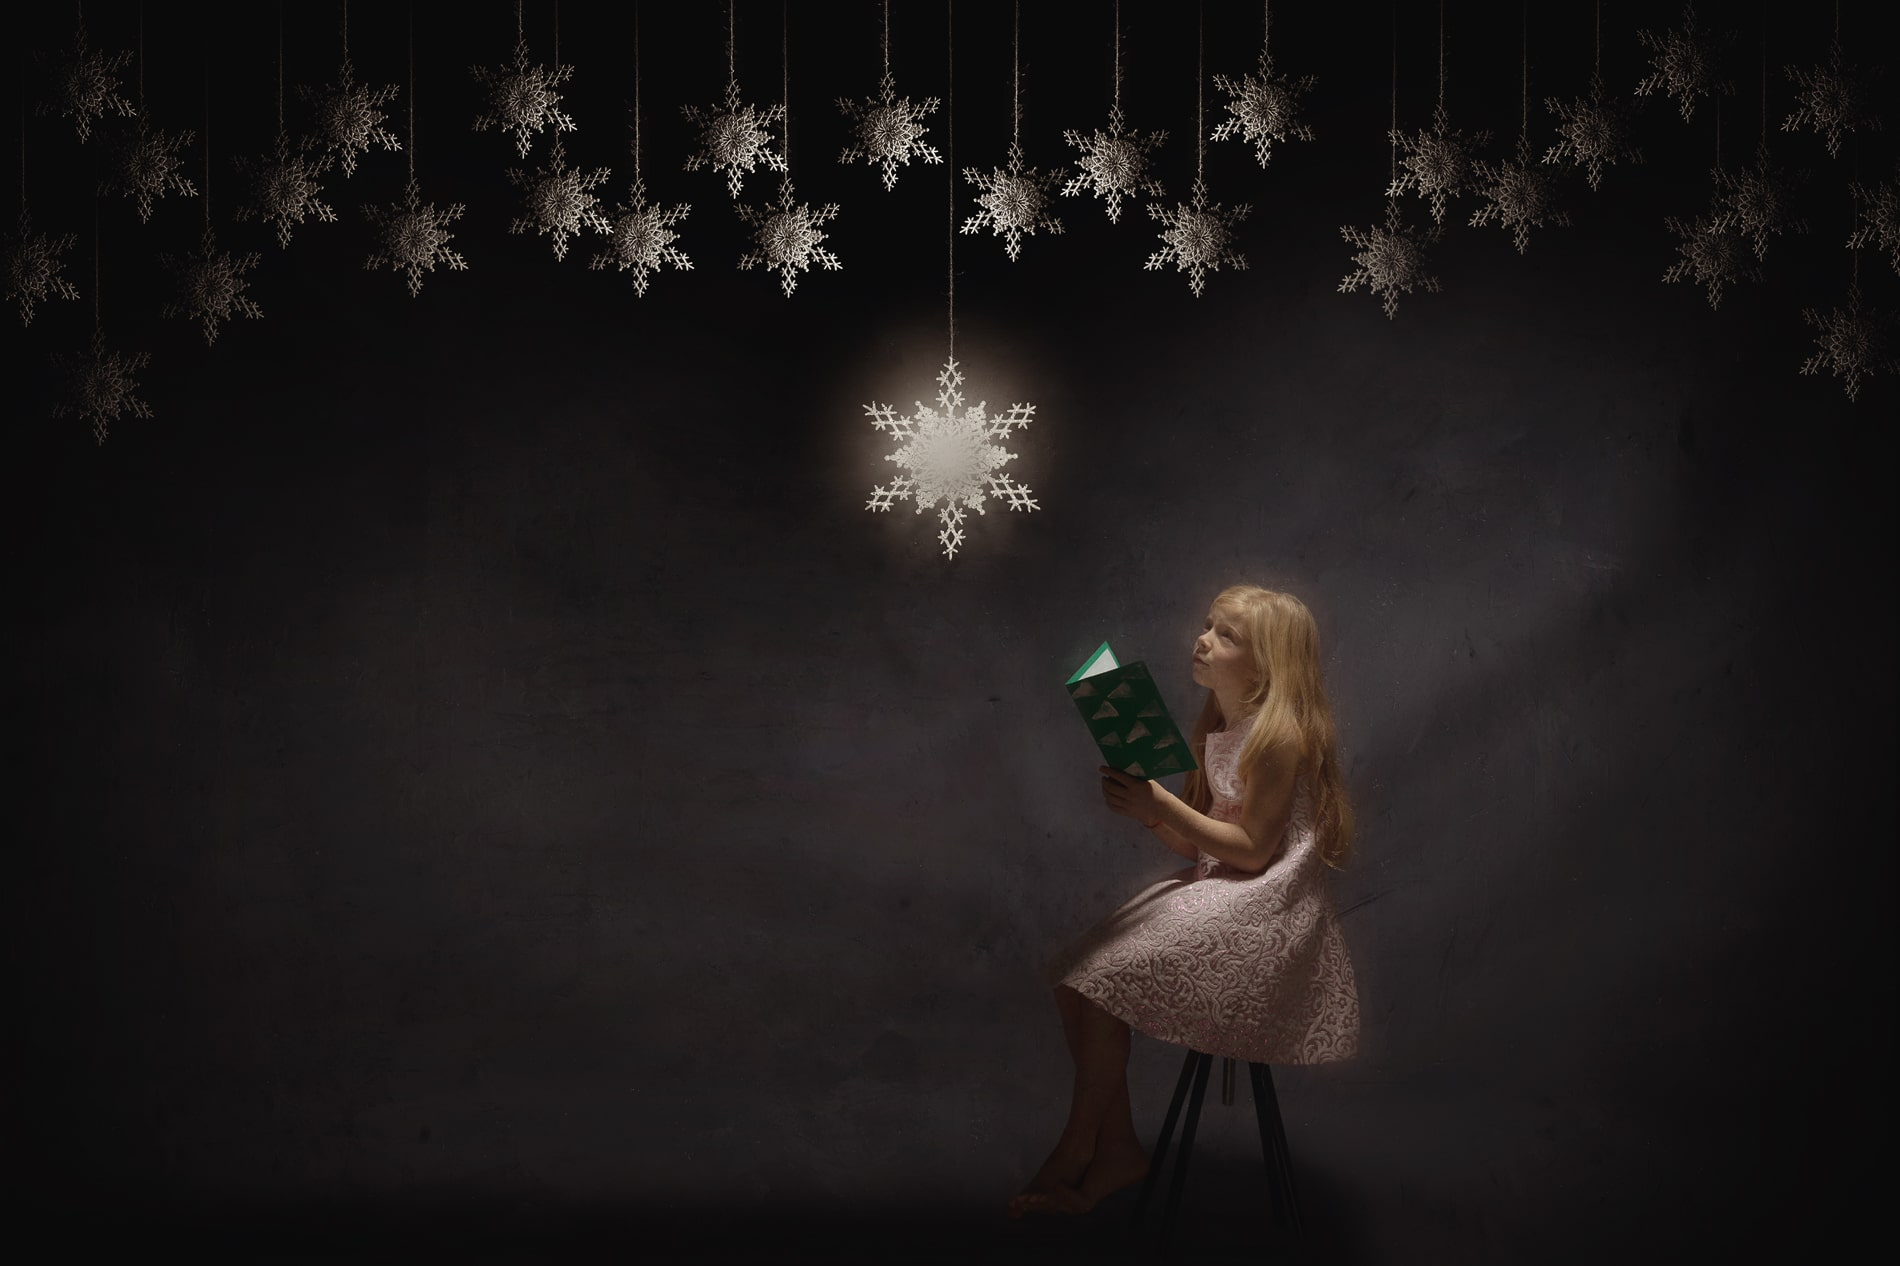 Sara leest haar nieuwjaarsbrief